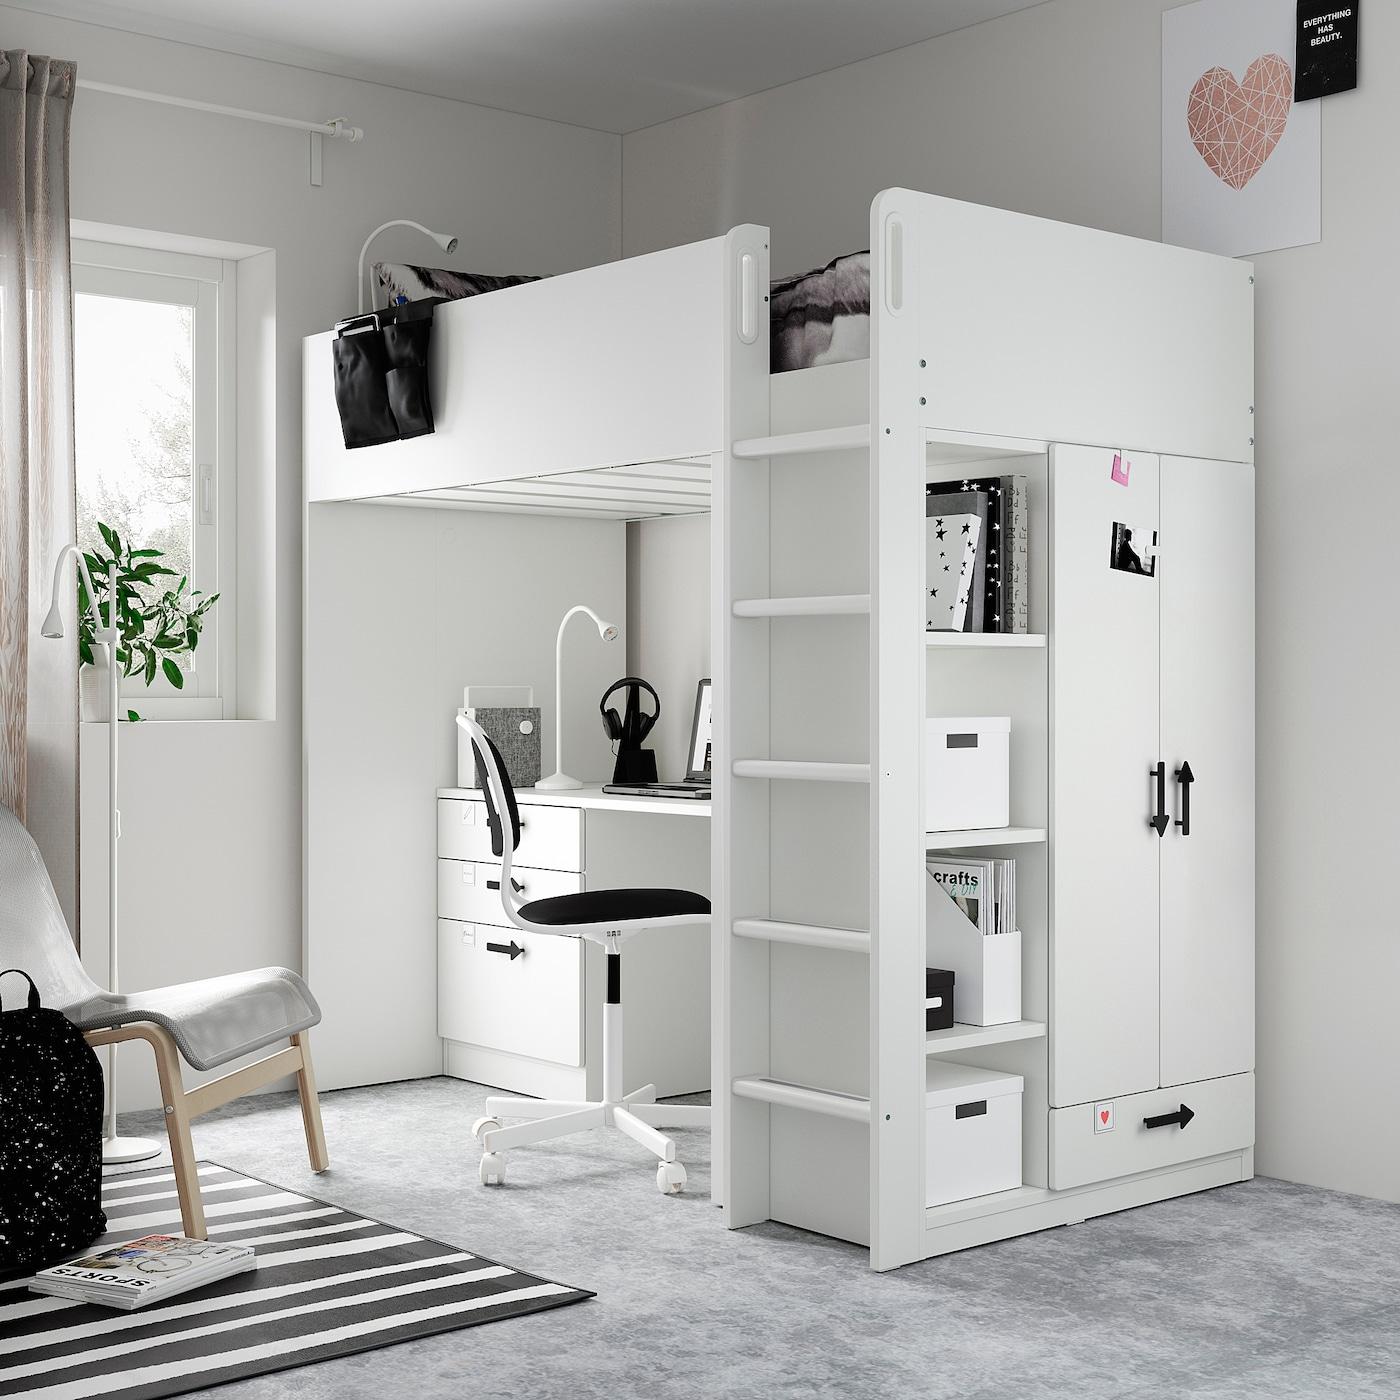 Picture of: Smastad Hojseng Hvid Hvid Med Skrivebord Med 4 Skuffer Ikea